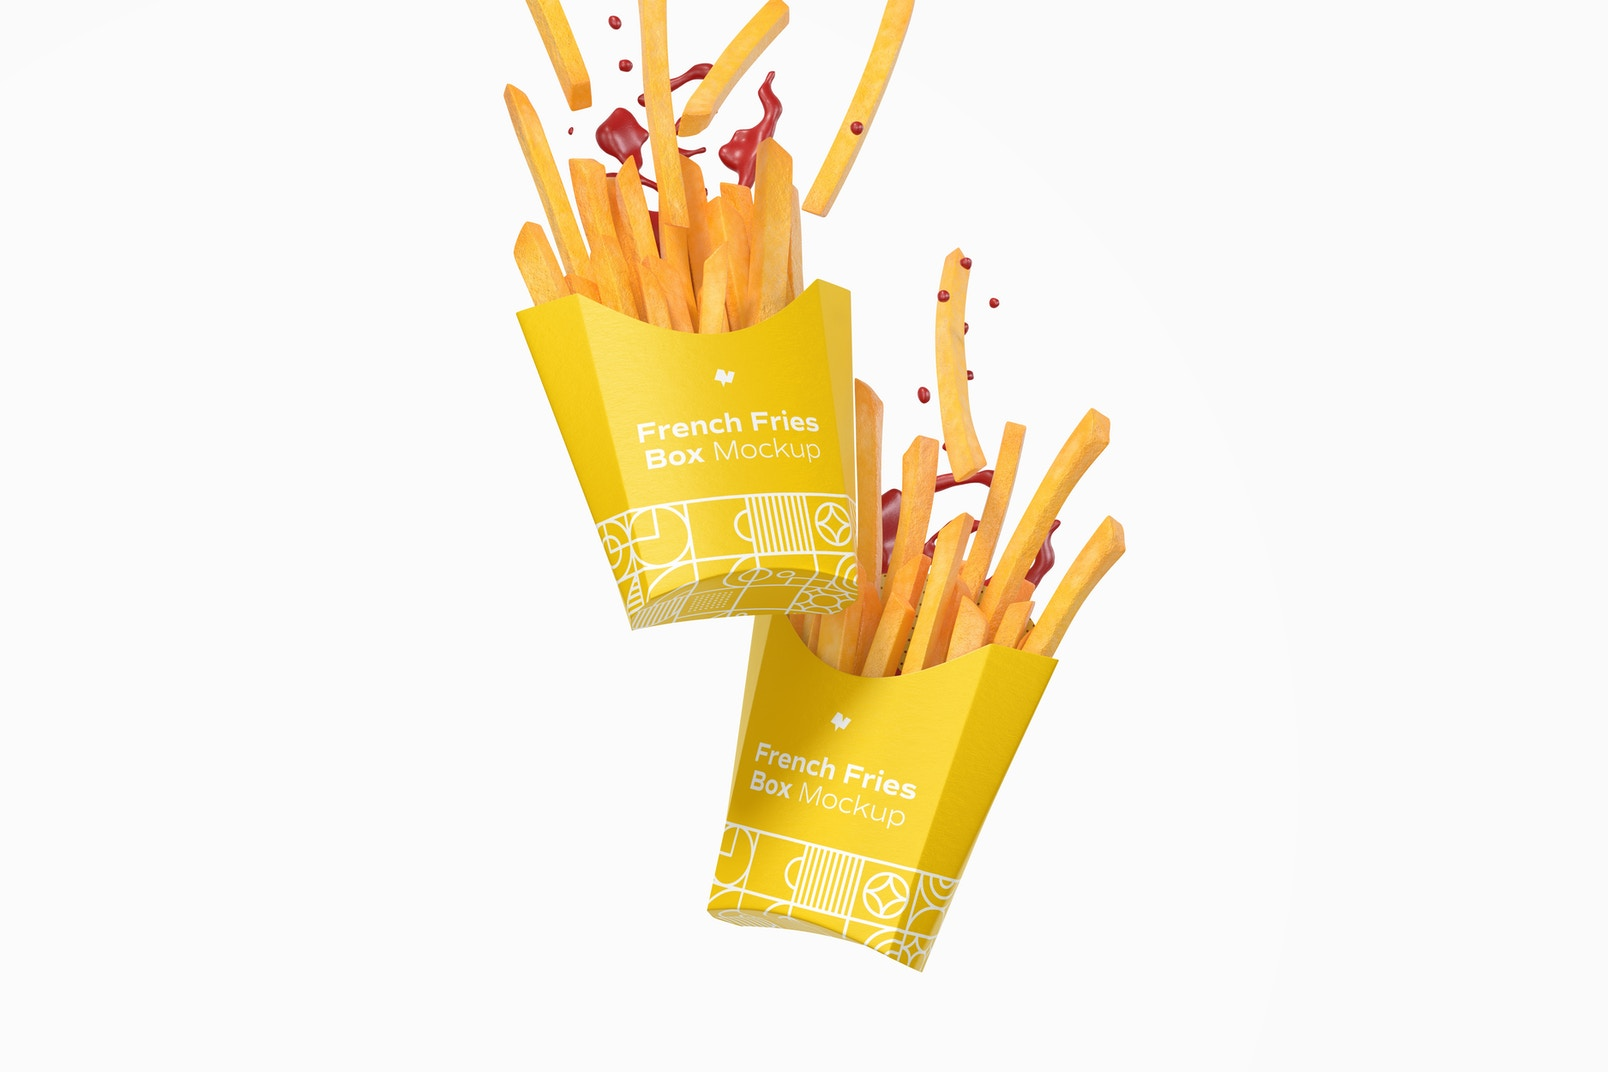 French Fries Box Mockup, Falling